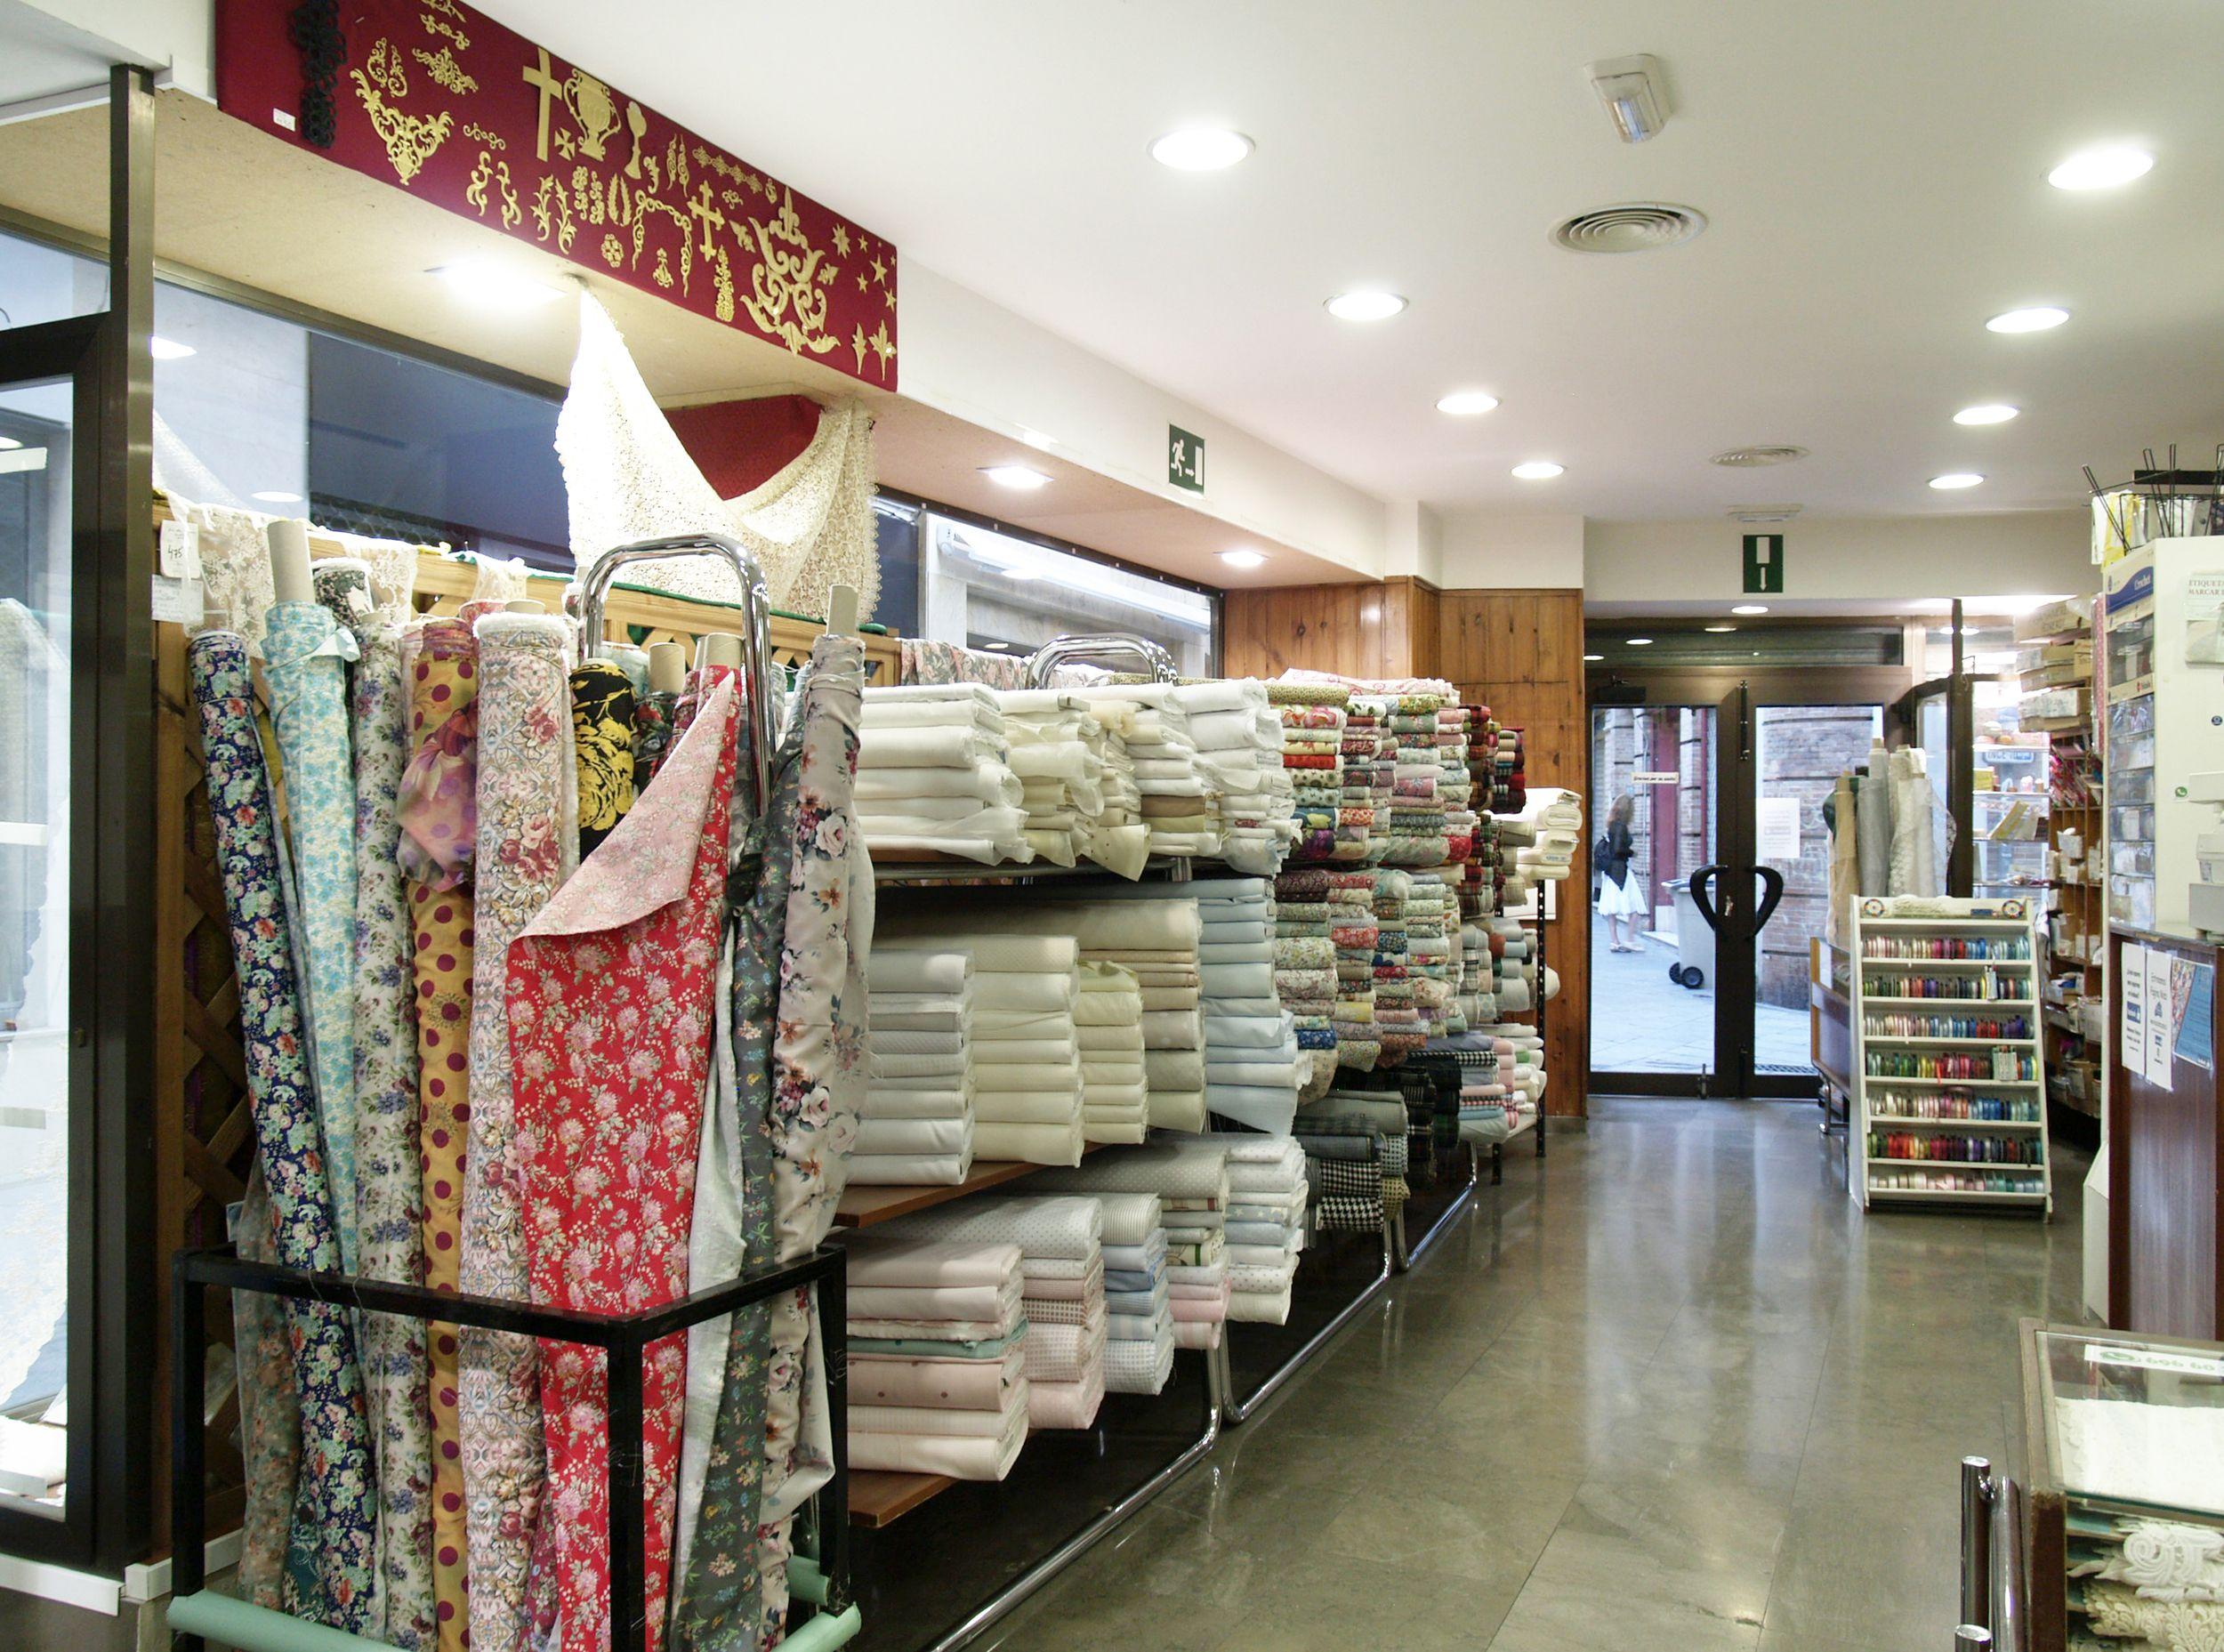 Almacén de telas en Sevilla